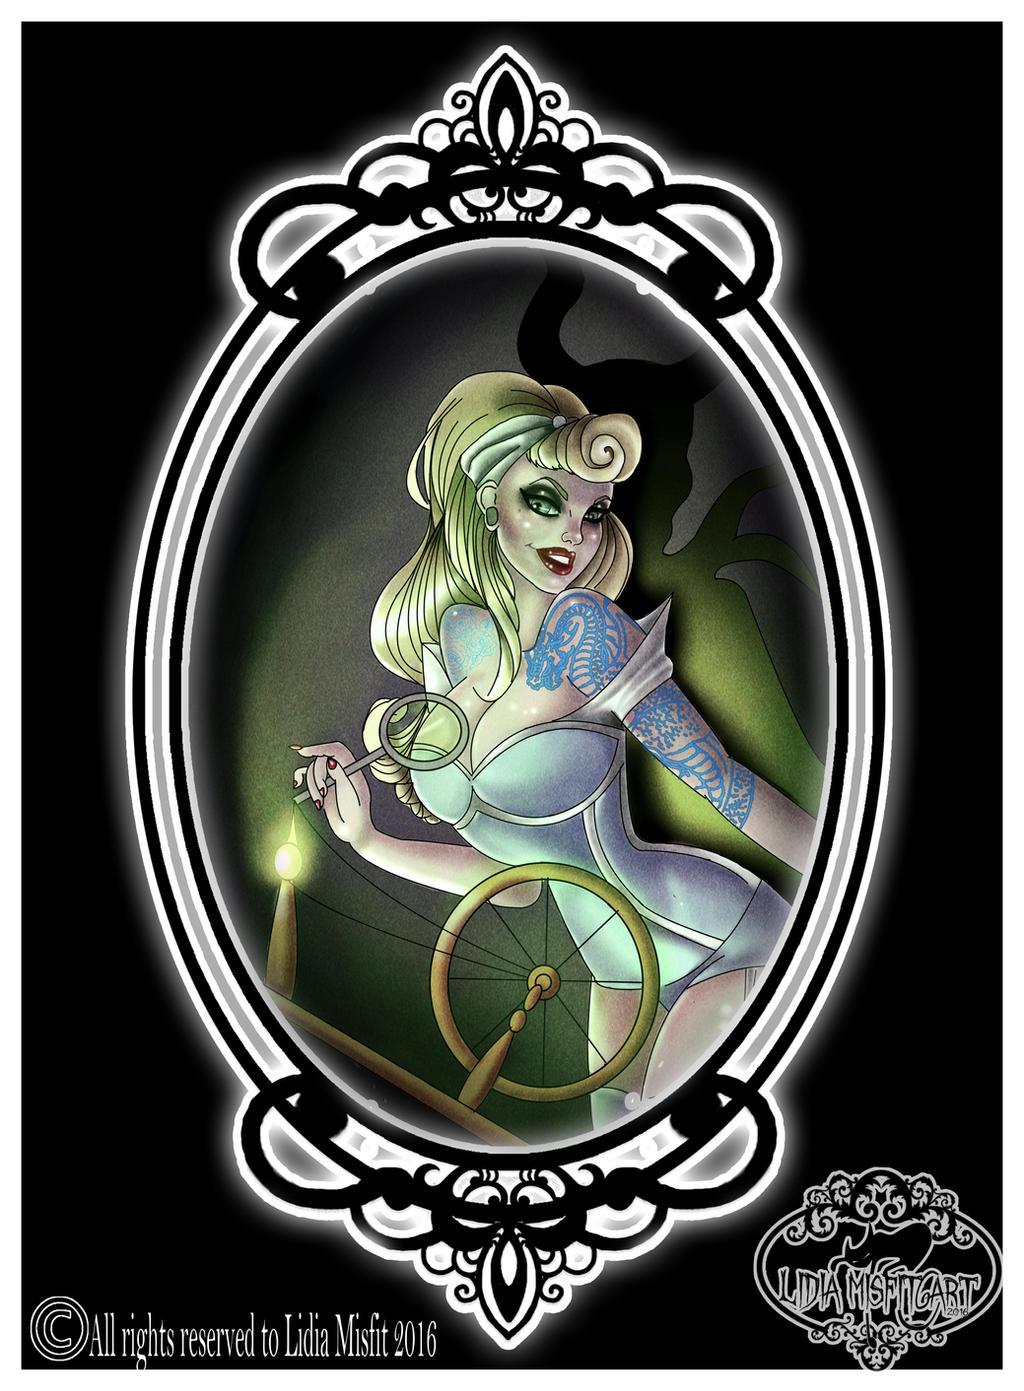 Aurora tattoo pin up sleeping beauty by MissMisfit13